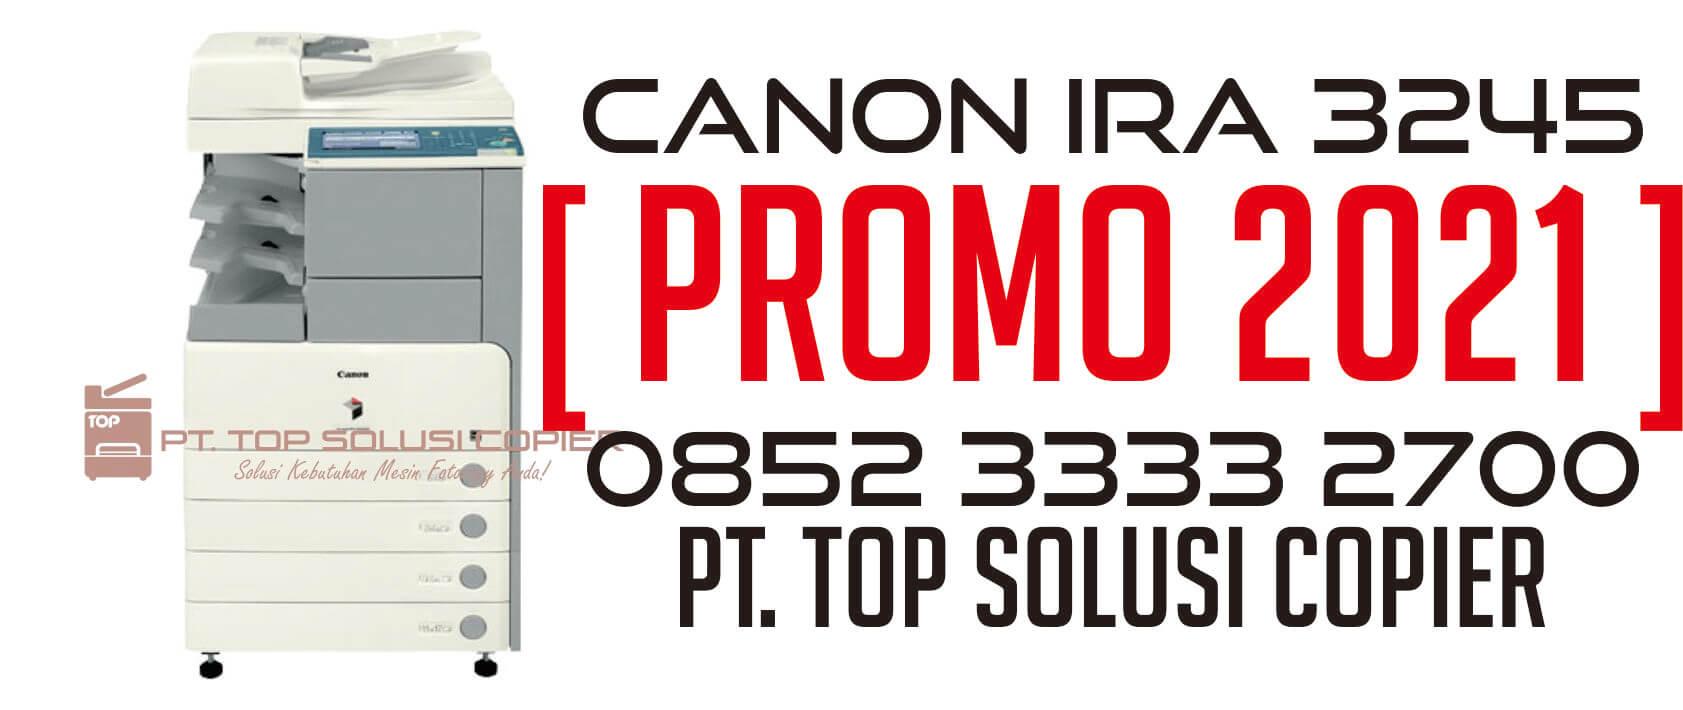 CANON IRA 3245